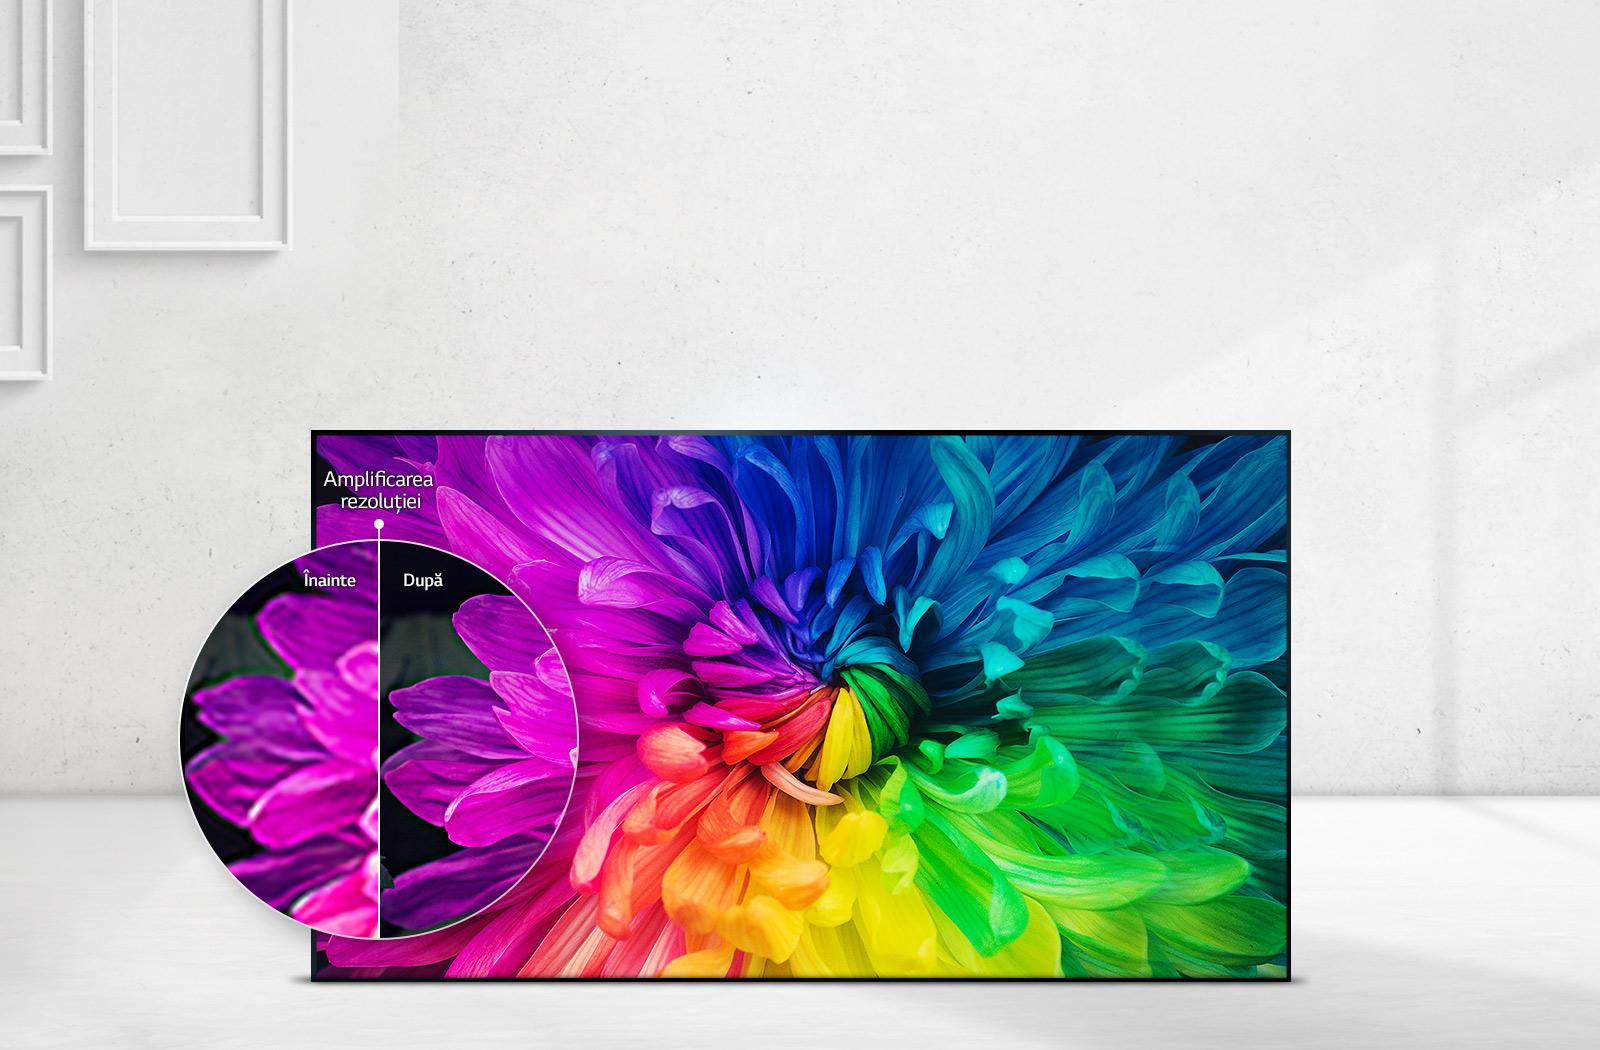 Televizor LG 43LJ515V FHD